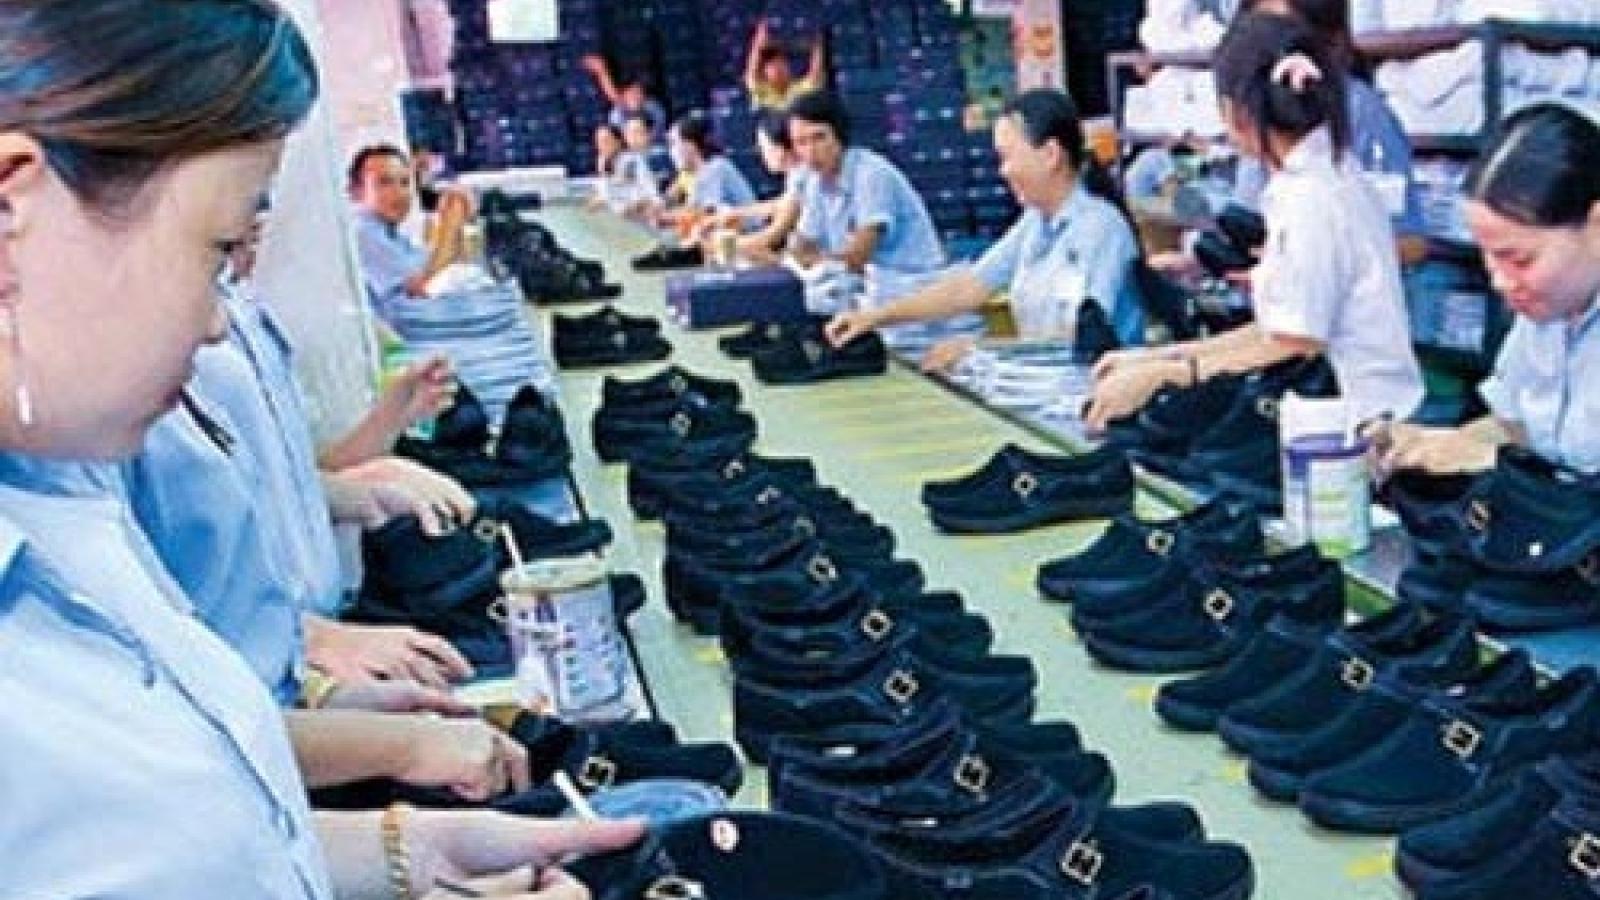 Footwear exports reach nearly US$5 billion